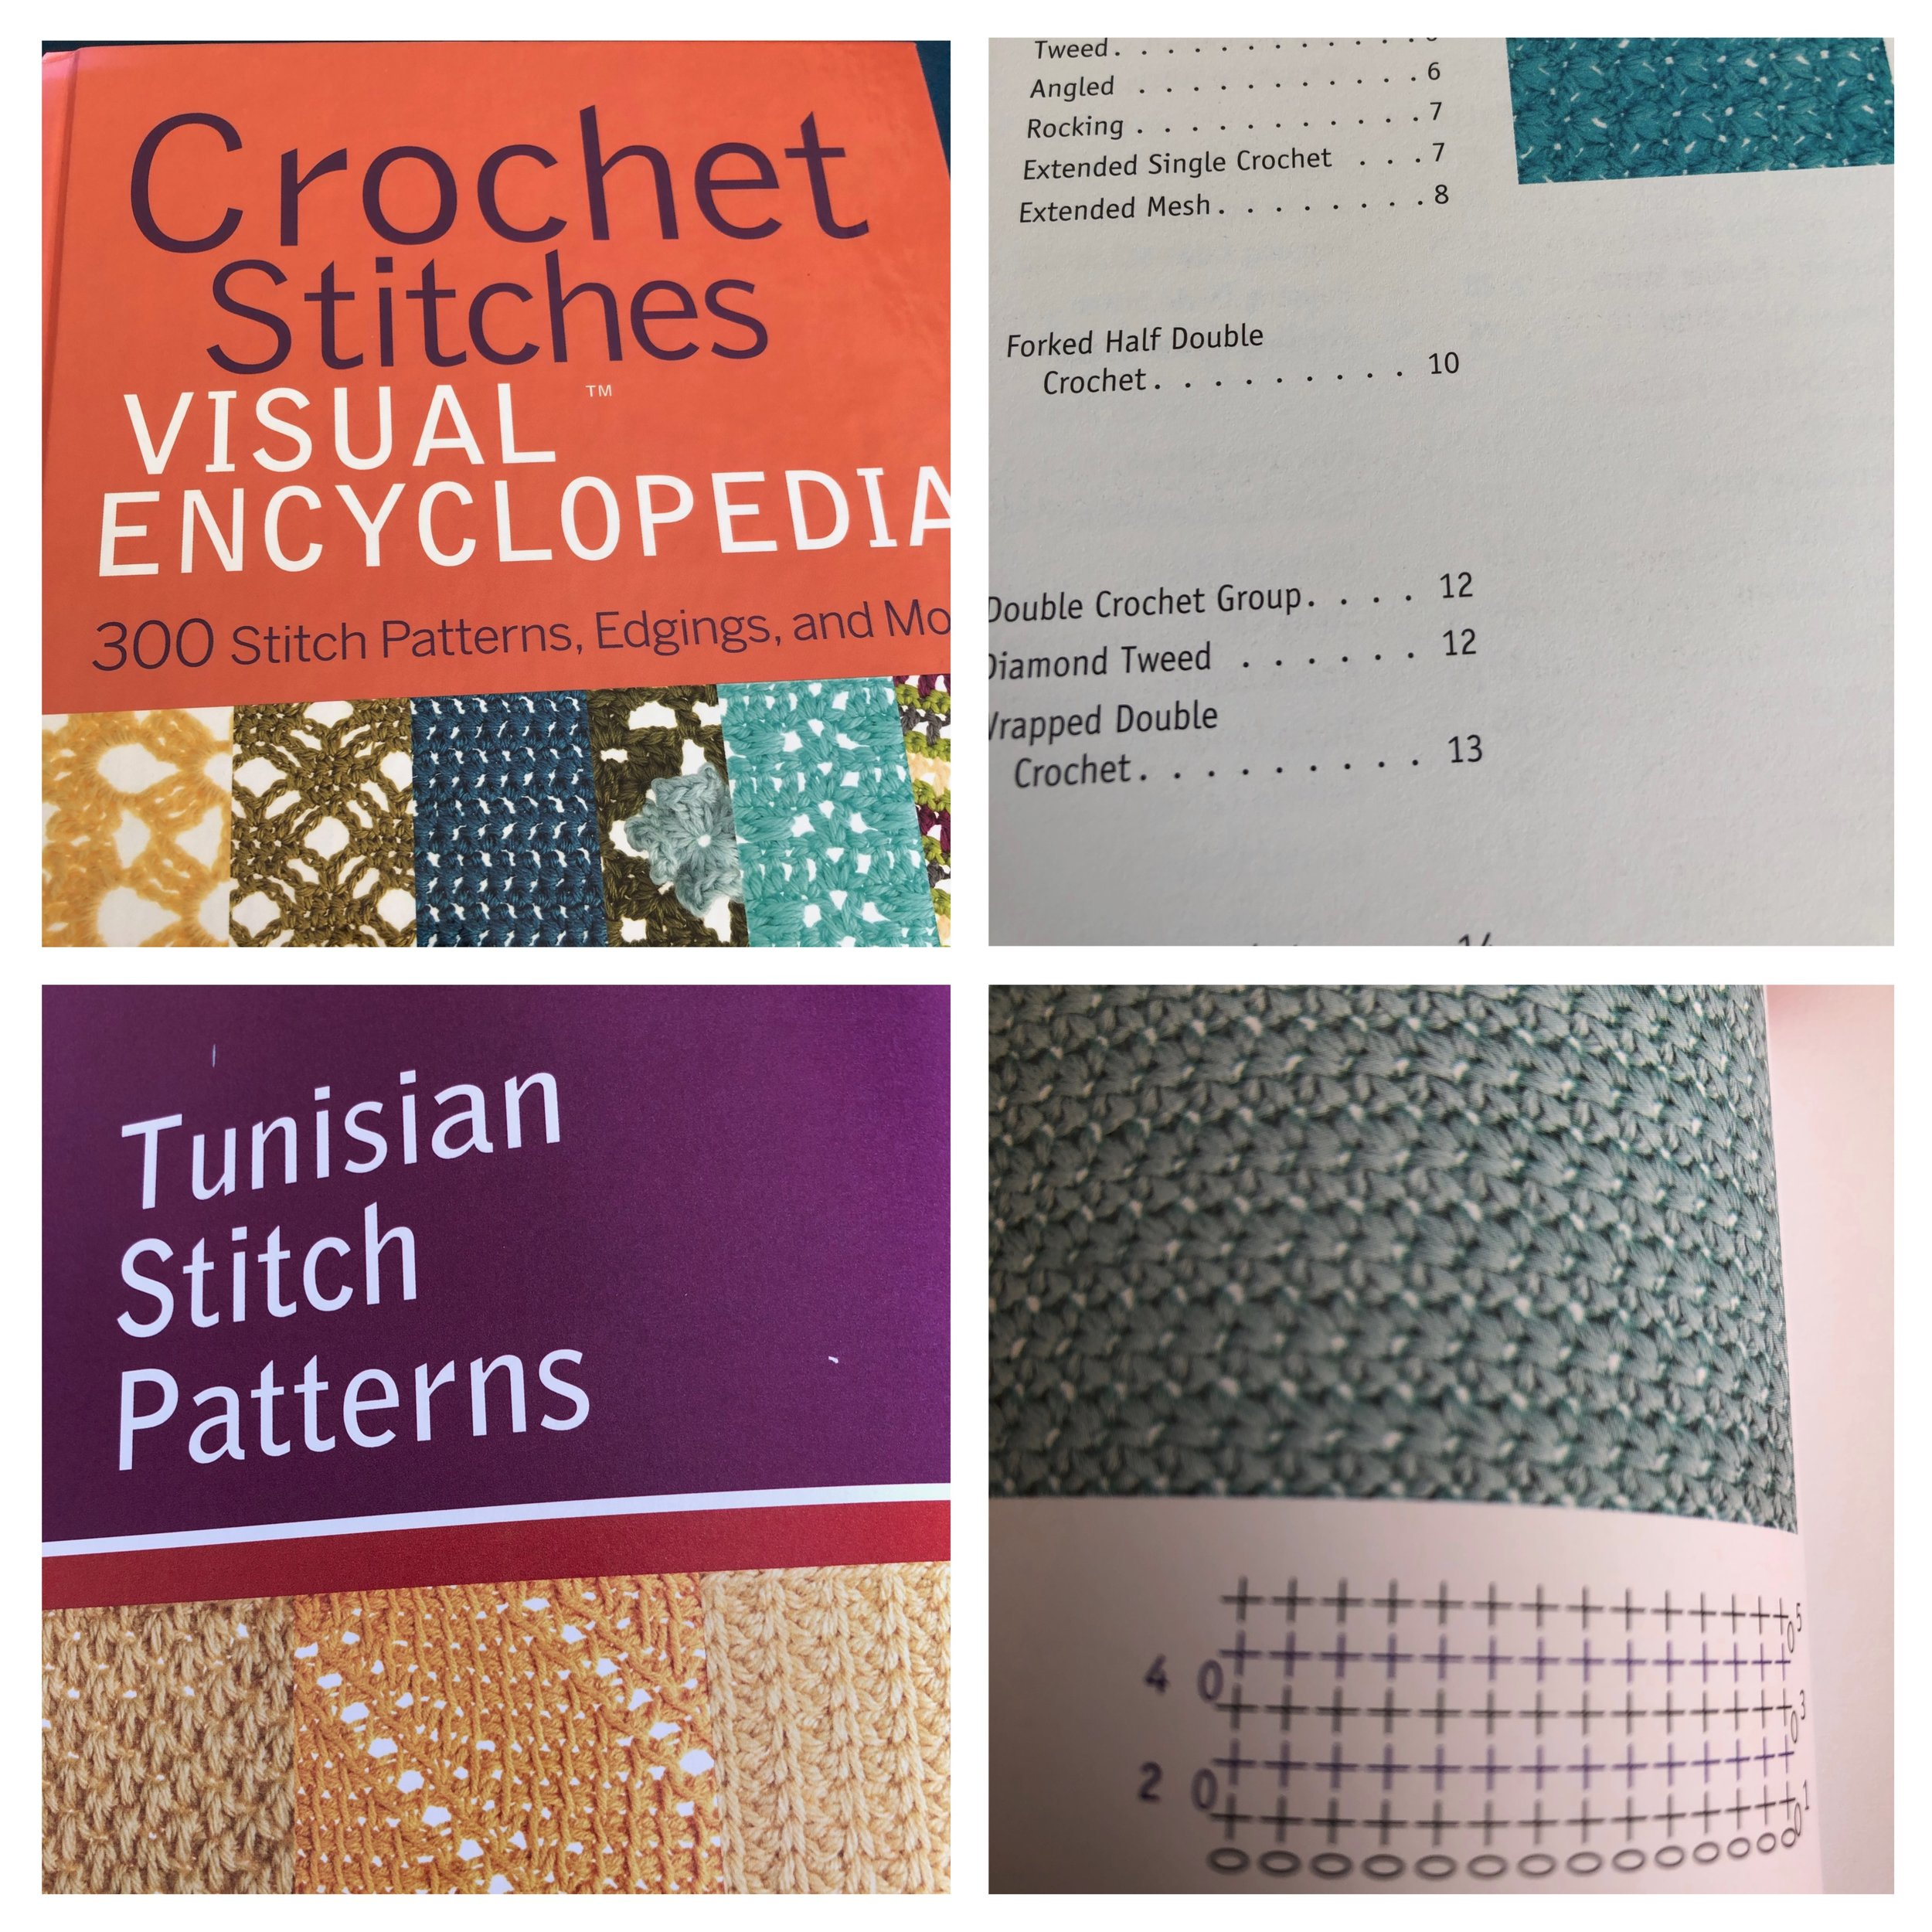 Crochet stitched book